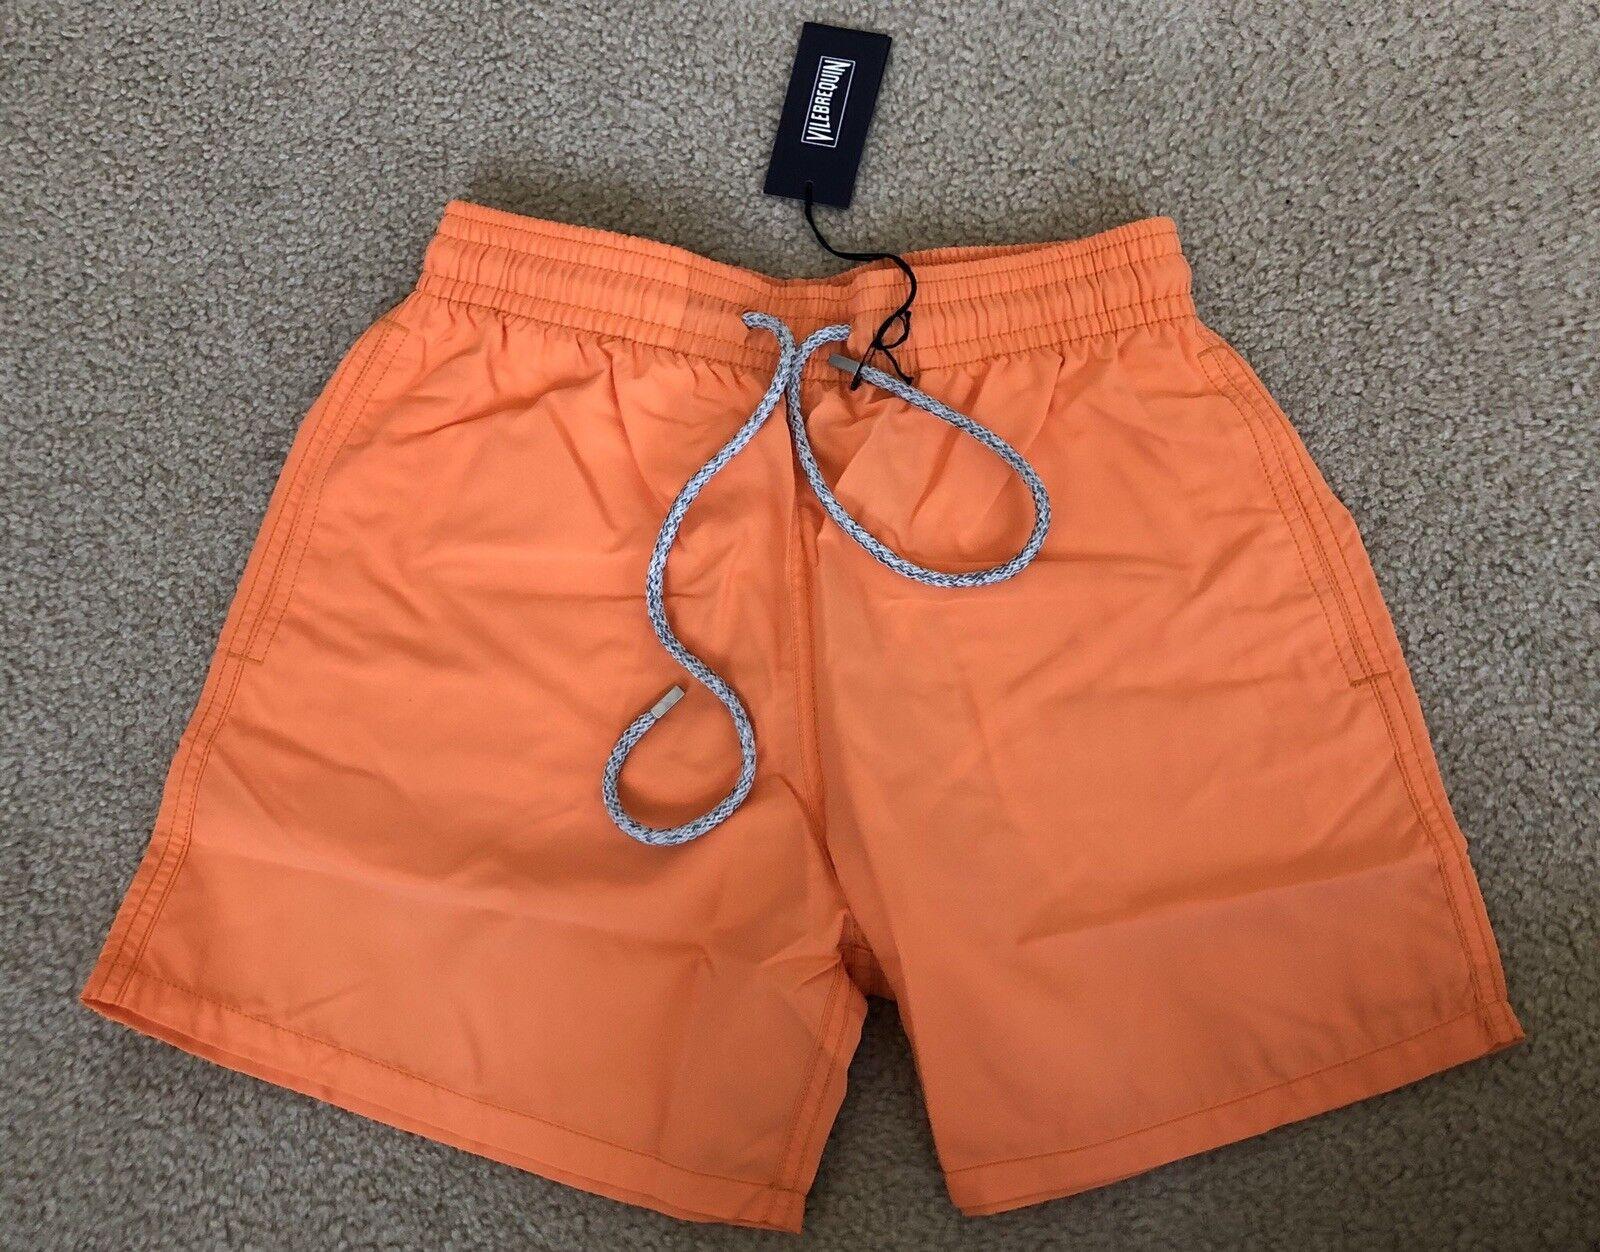 New w Tags Authentic Vilebrequin MOOREA Swim Trunks - Tangerine - Men SMALL - S